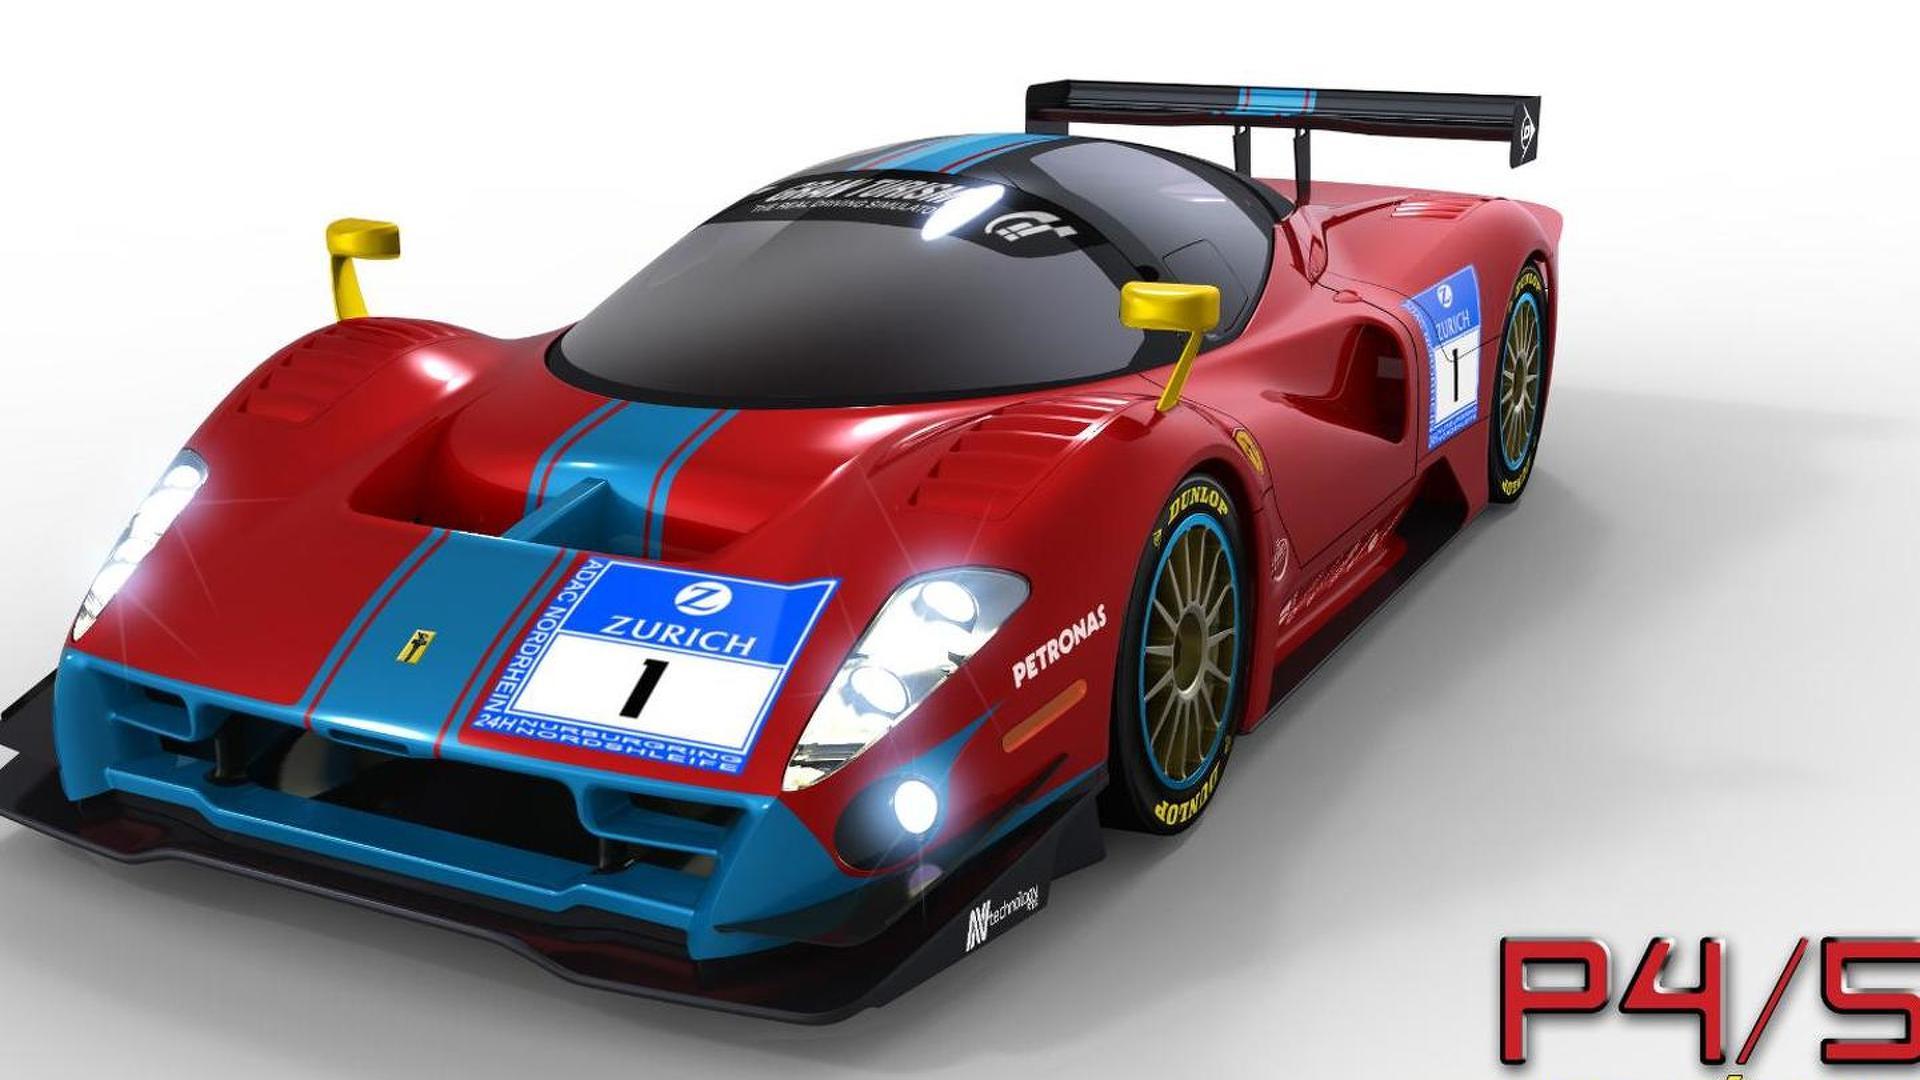 Ferrari P4/5 Competizione - first official rendering released